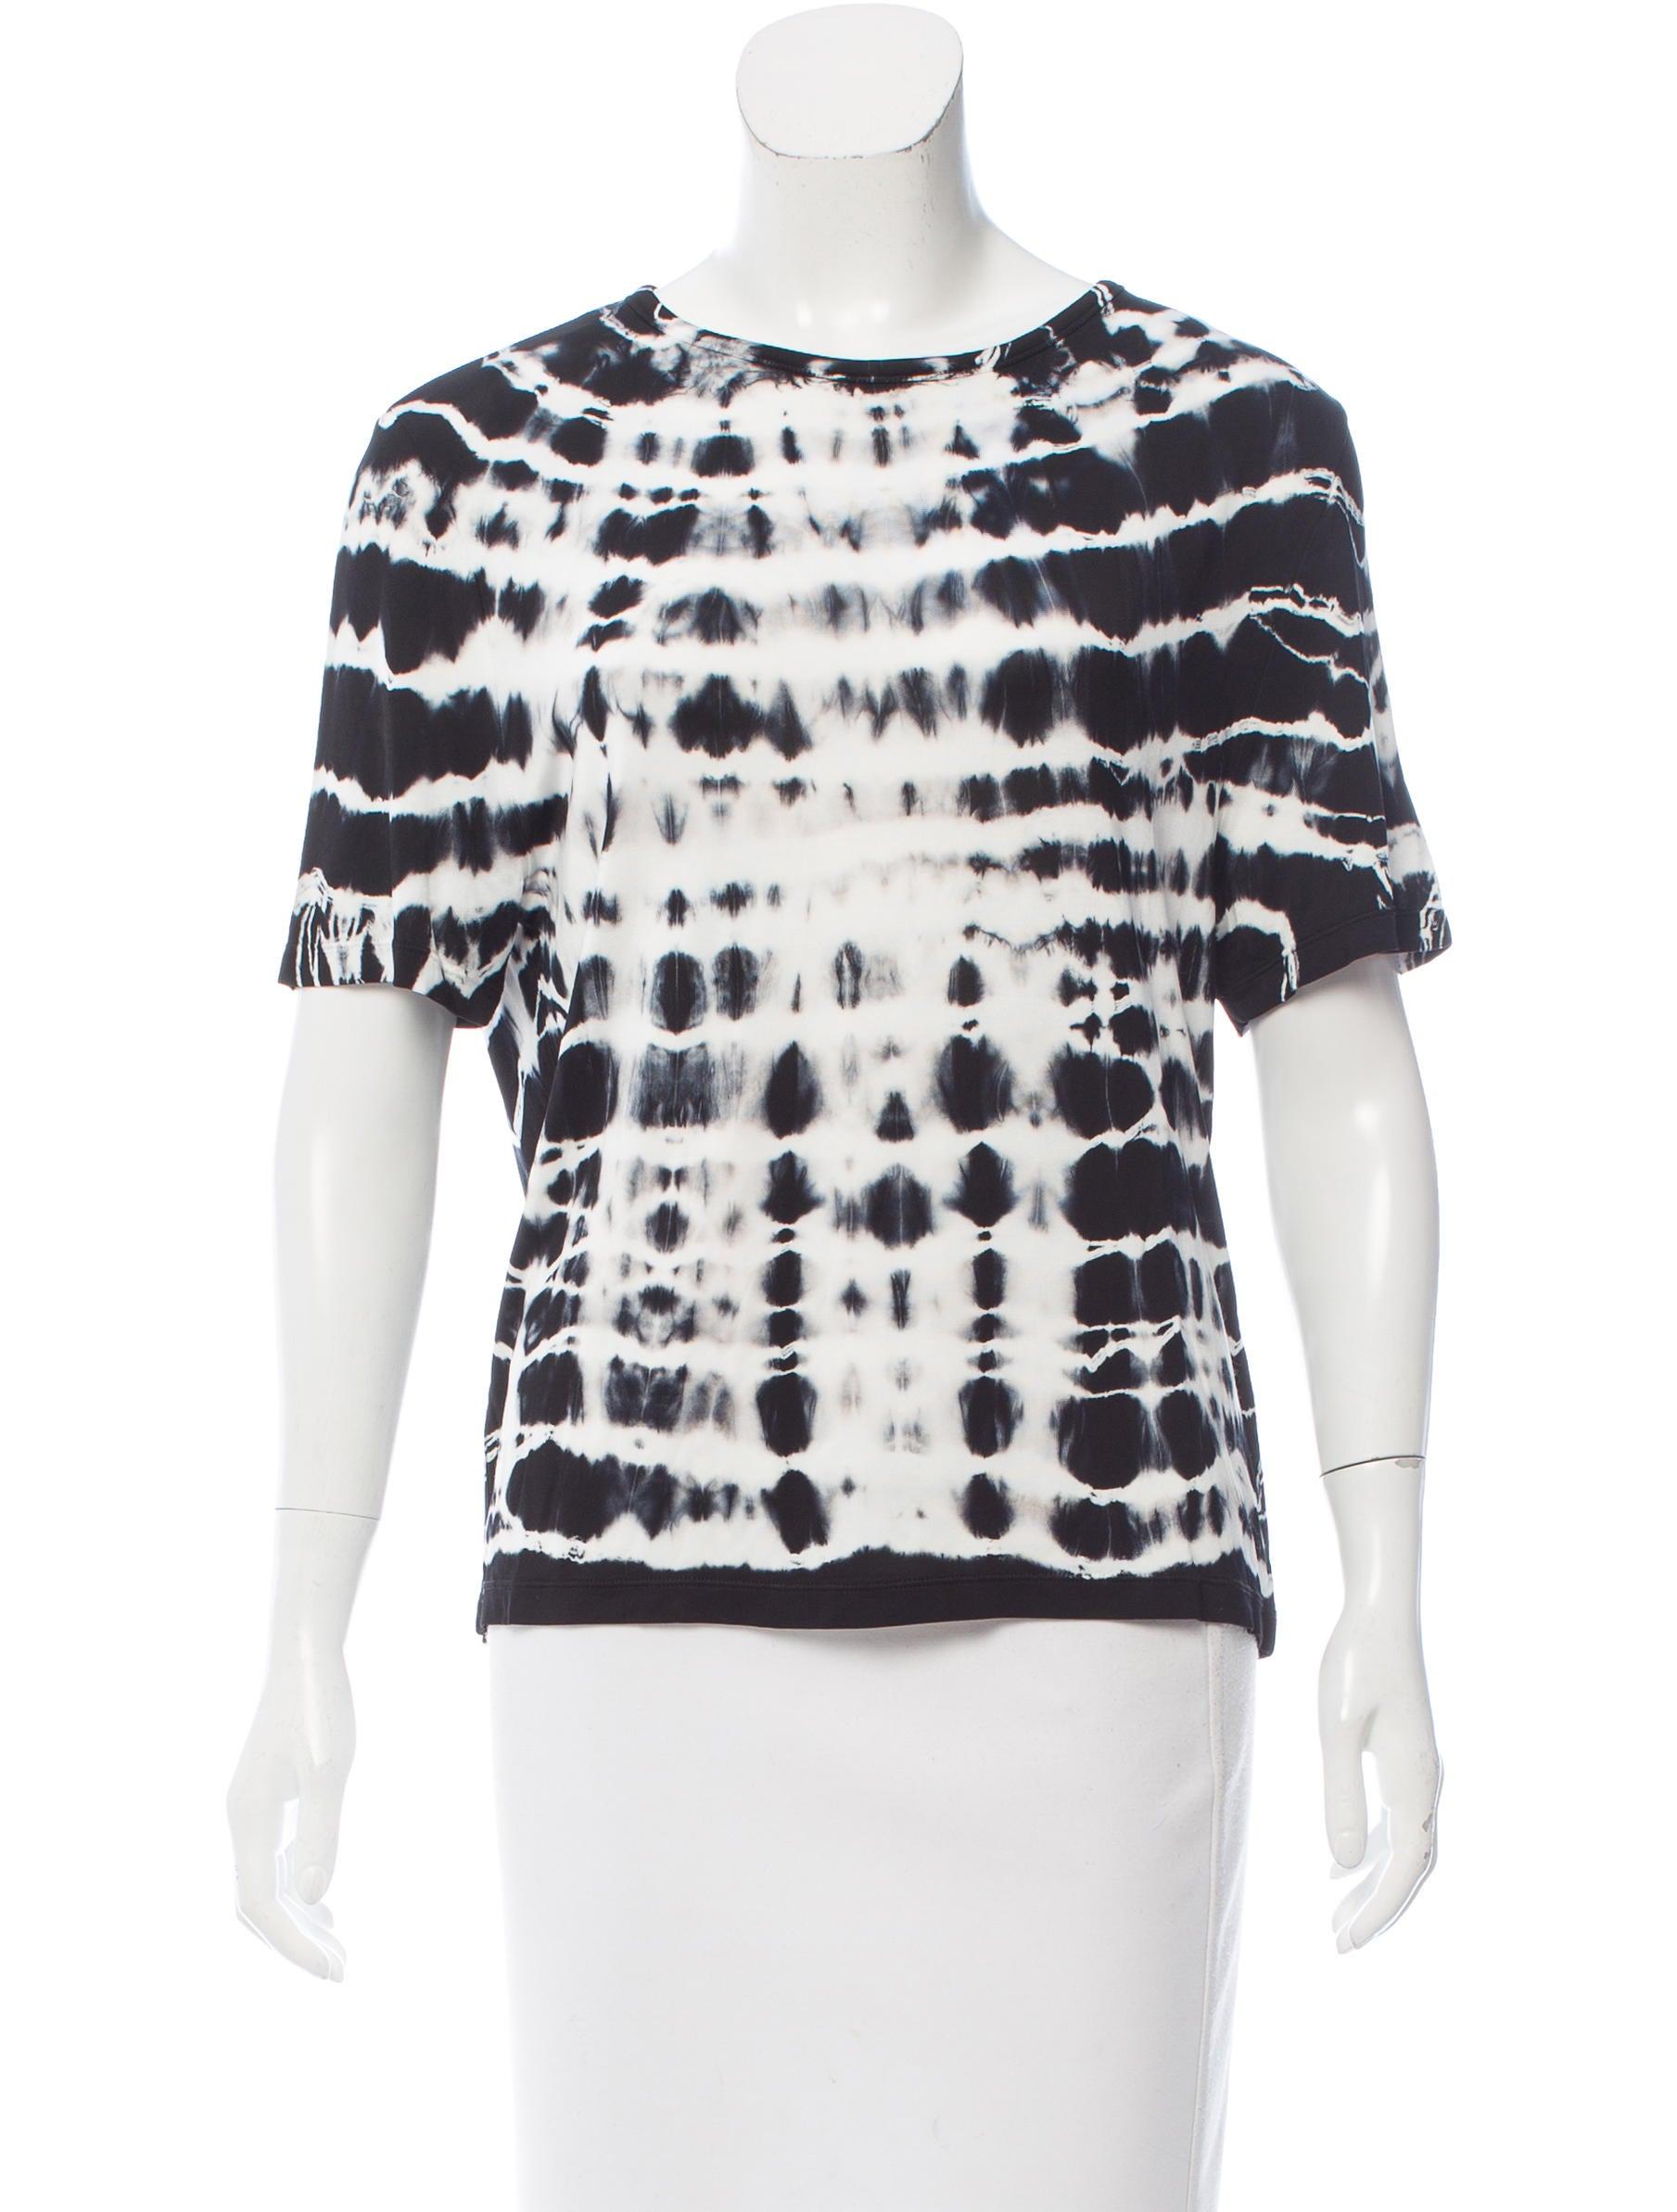 Acne Studios Short Sleeve Tie Dye T Shirt Clothing